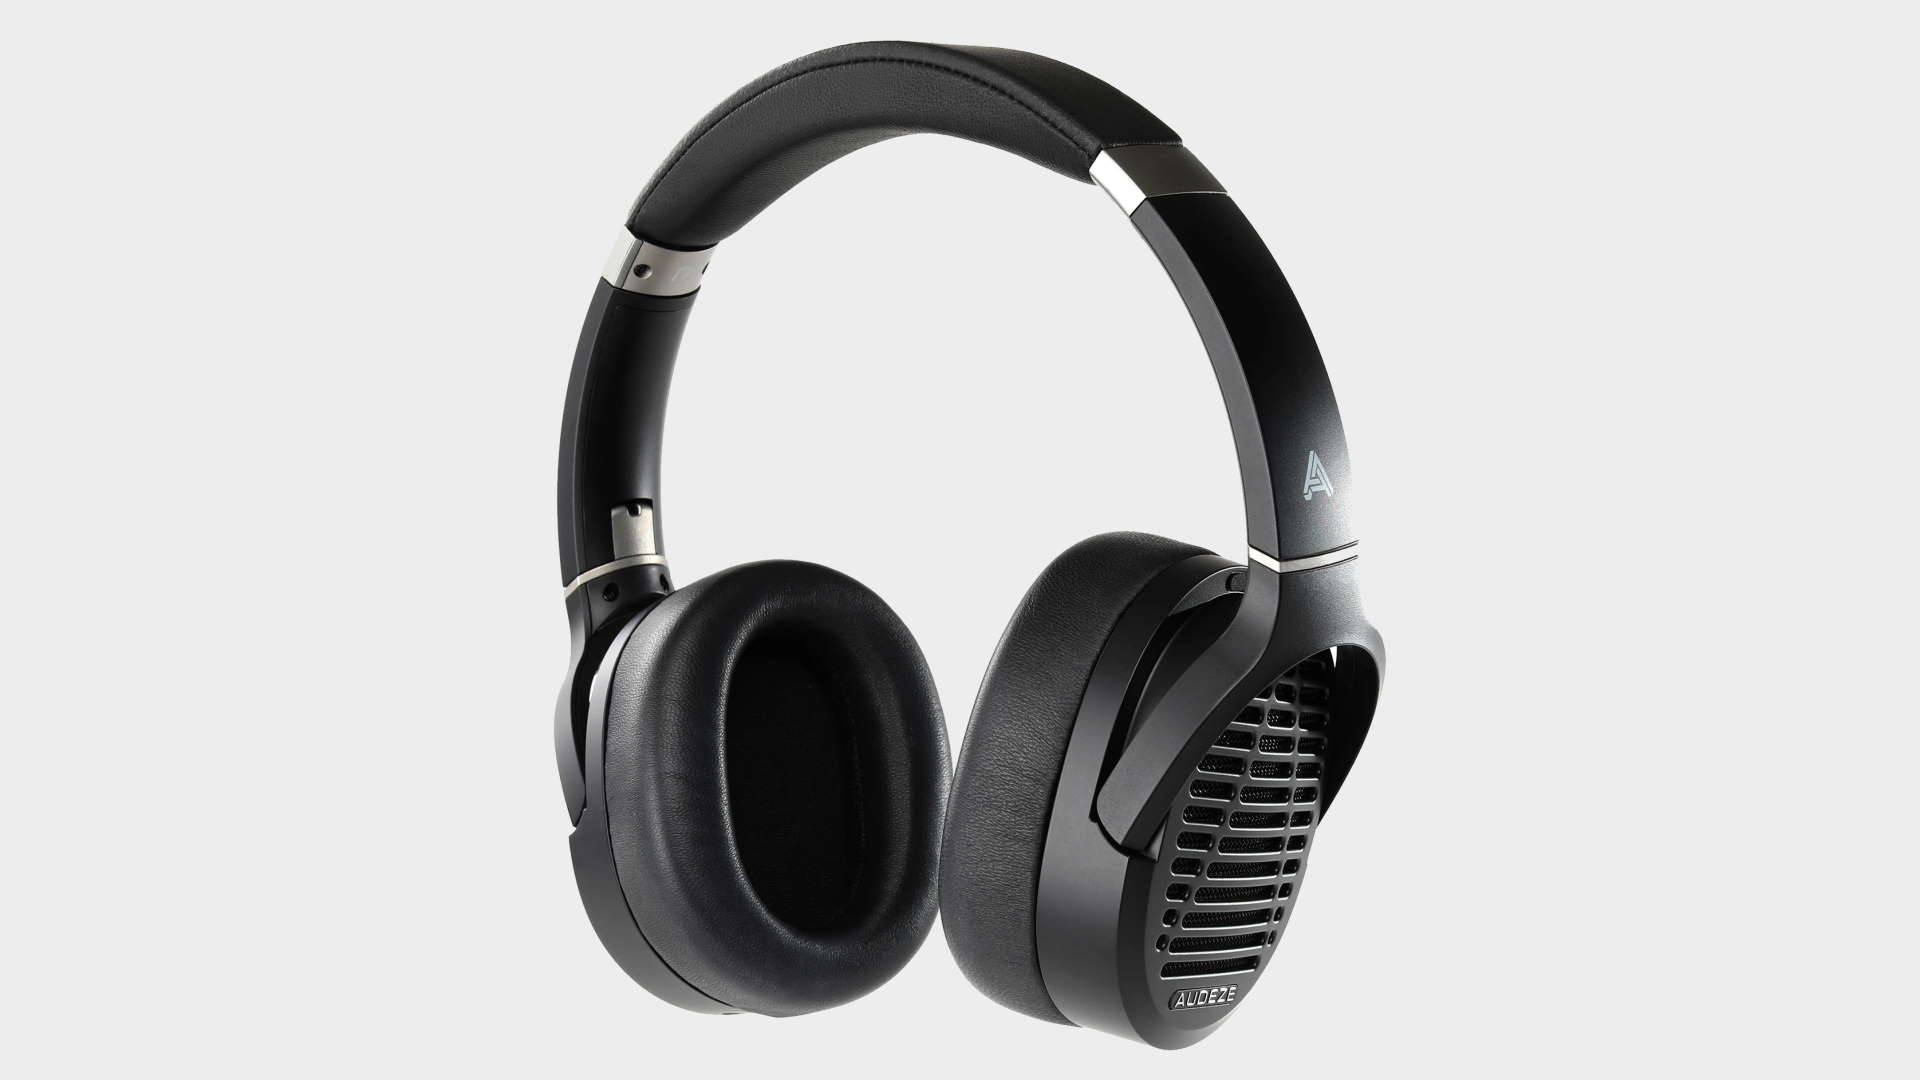 Audeze LCD-1 headphones on a blank background